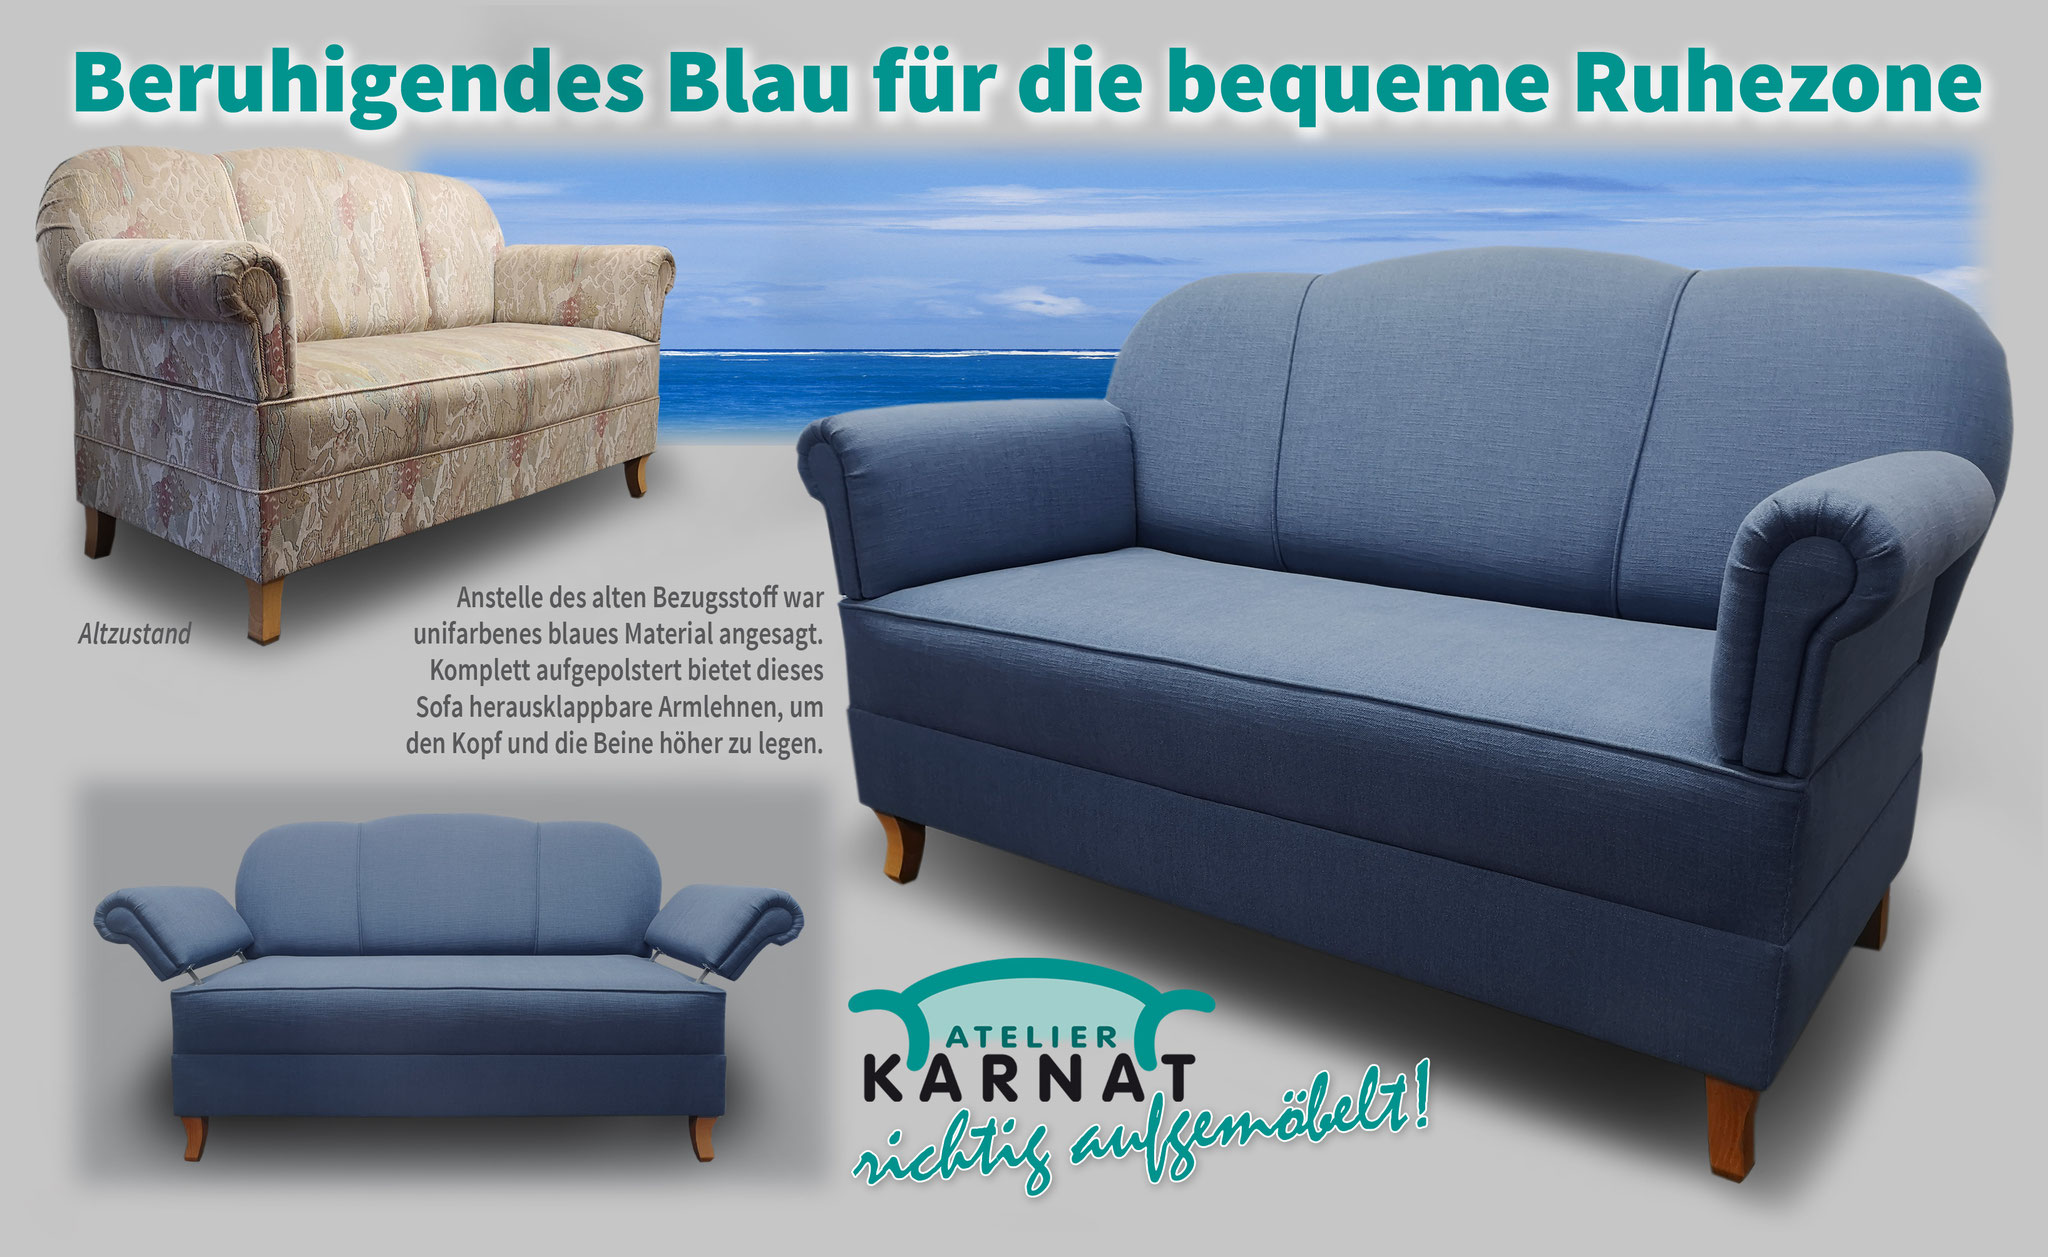 Sofas   Atelier Karnat   Polsterei   Raumausstattung